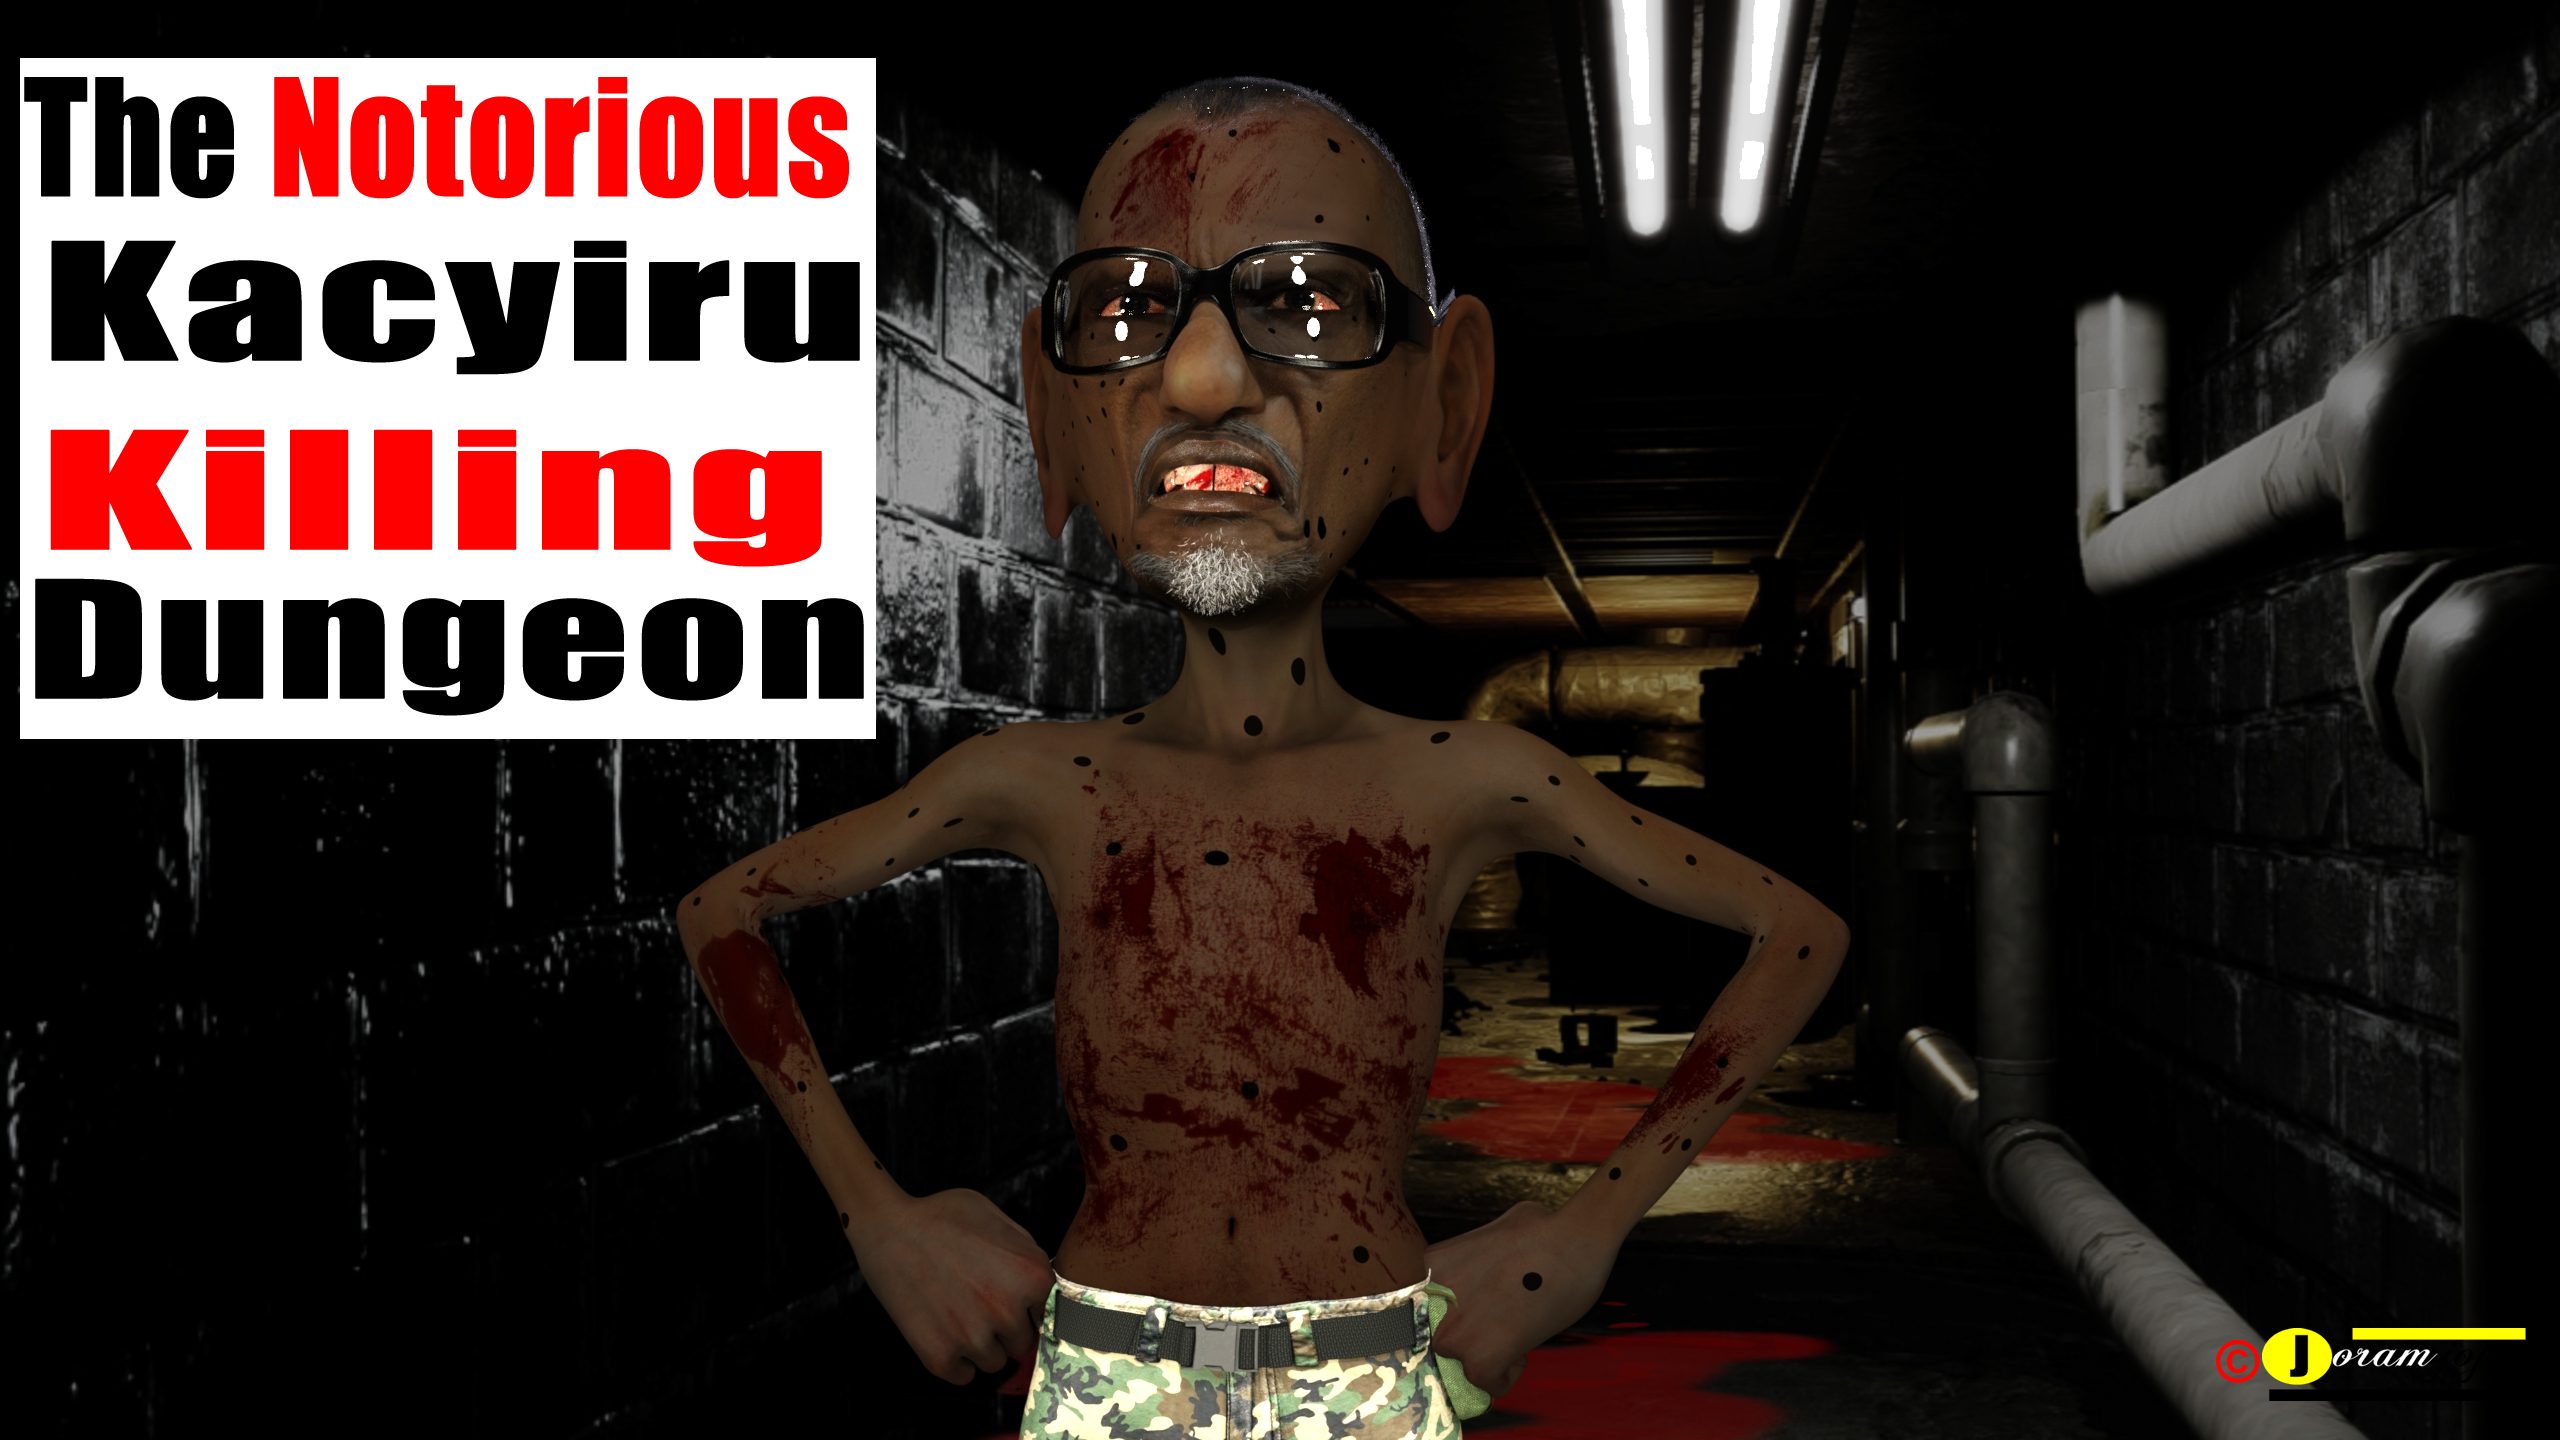 Paul Kagame Killing Machine